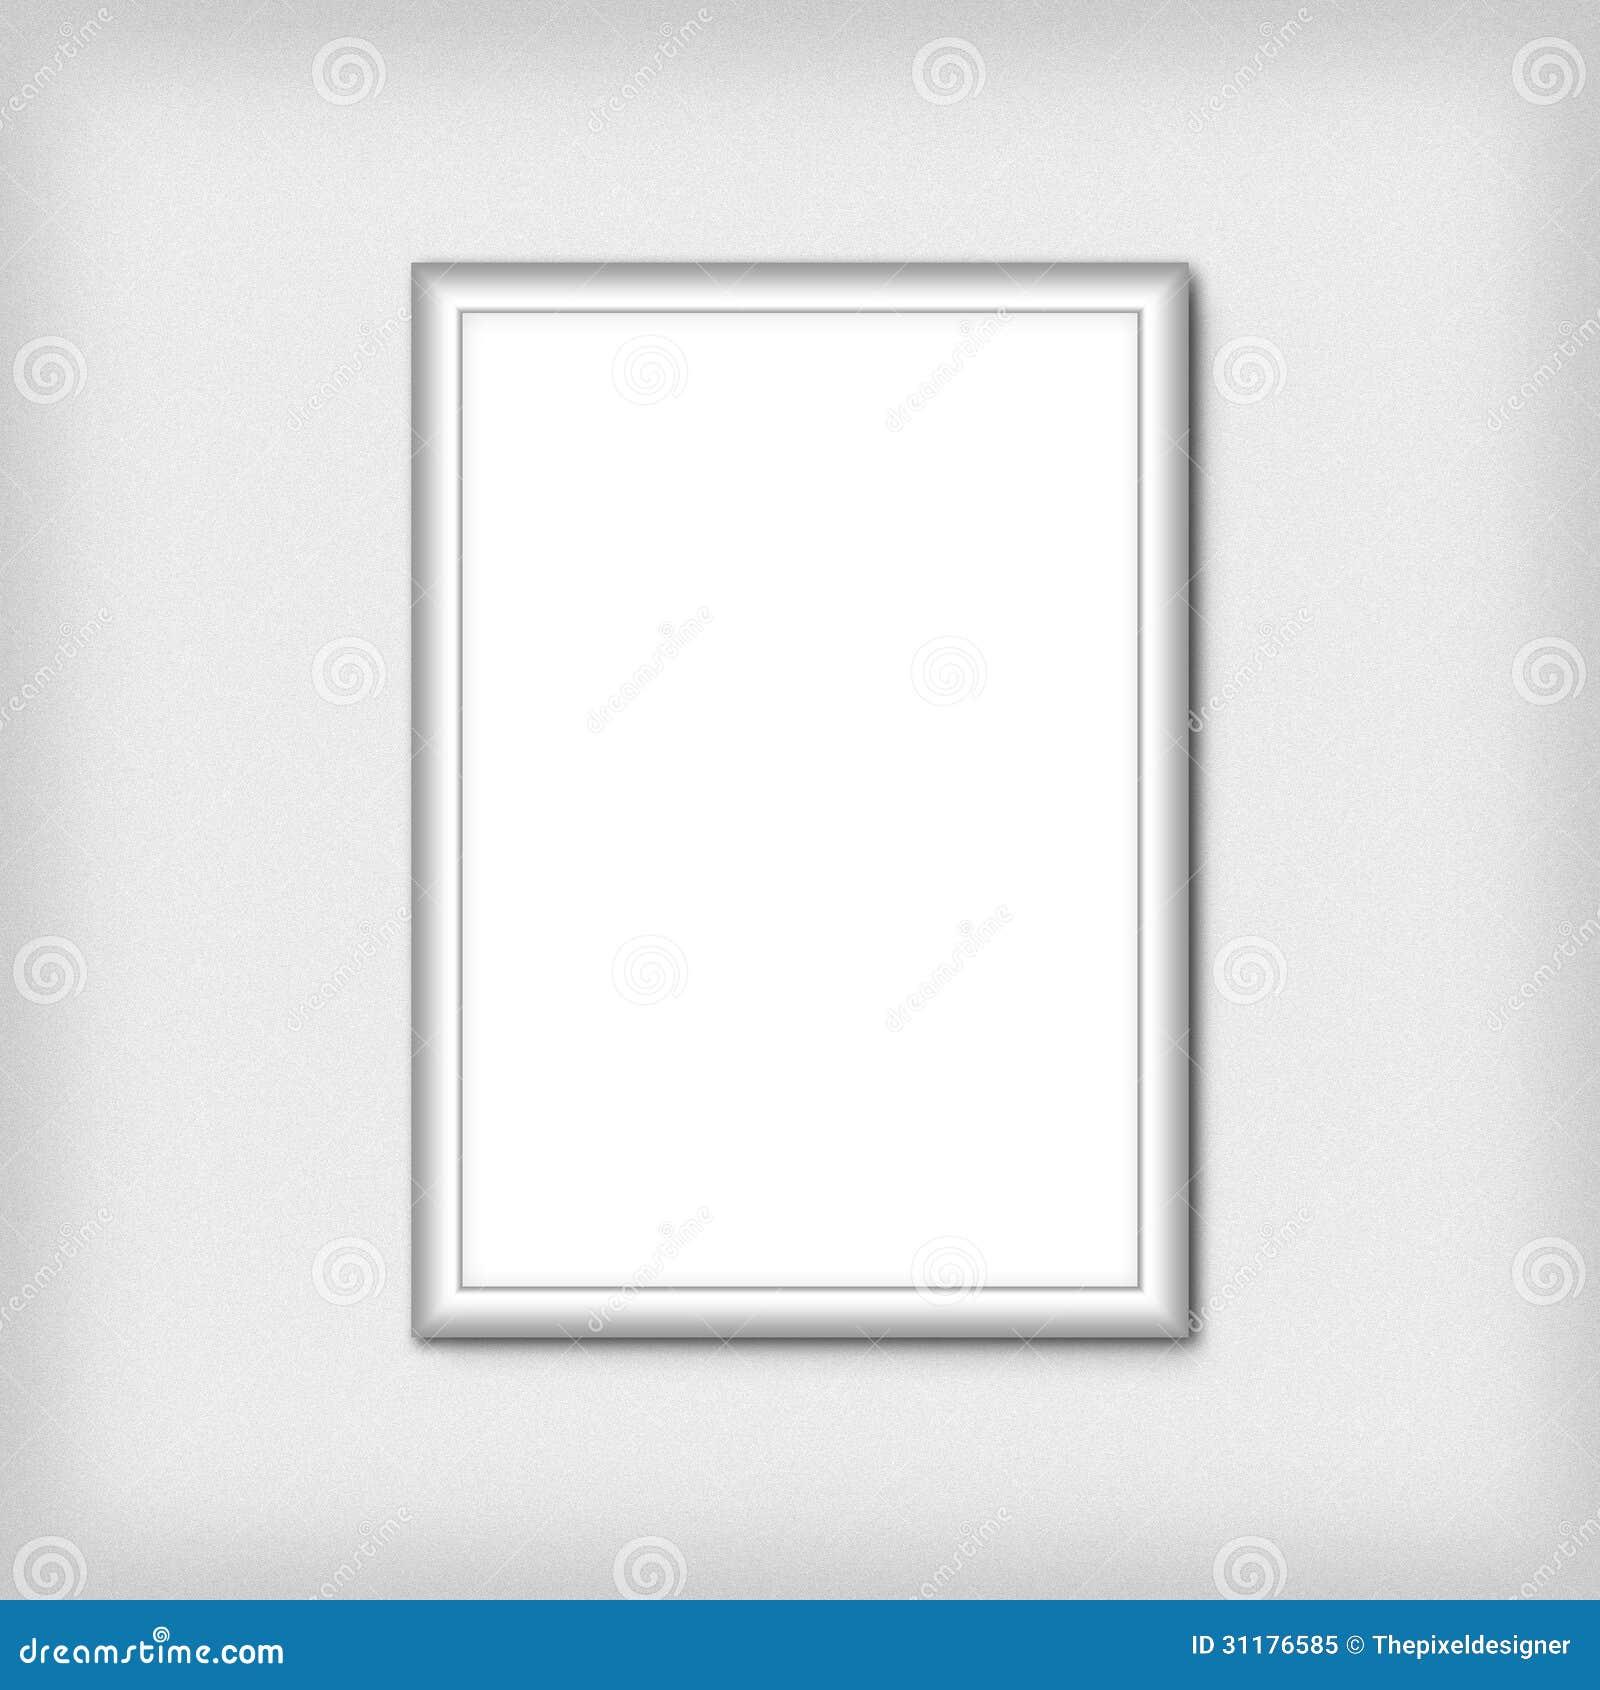 Blank empty white frame stock illustration. Illustration of isolated ...